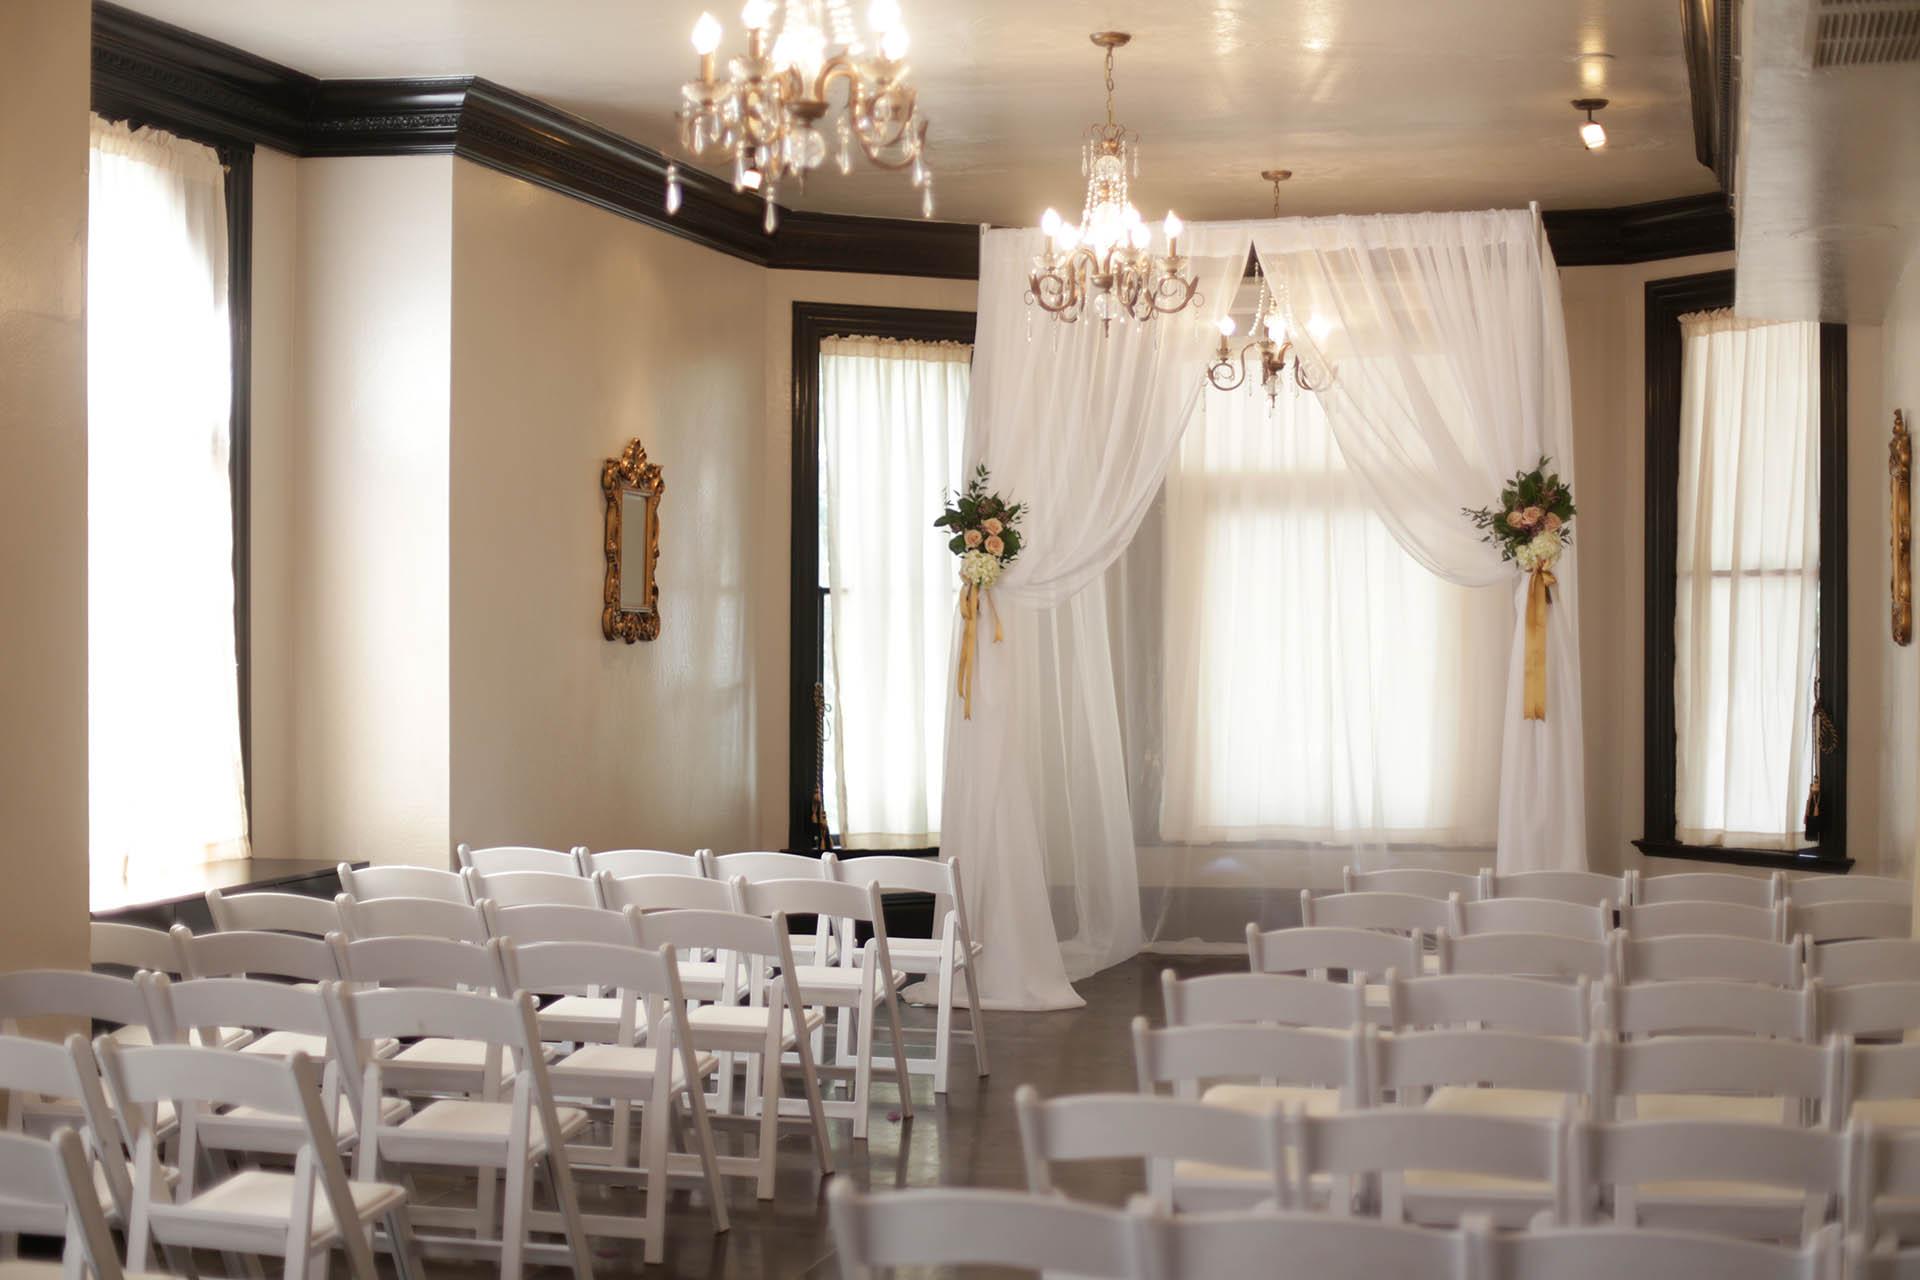 Sterling hotel wedgewood weddings indoor ceremony in the chandelier room at wedgewood weddings sterling hotel sacramento california junglespirit Images